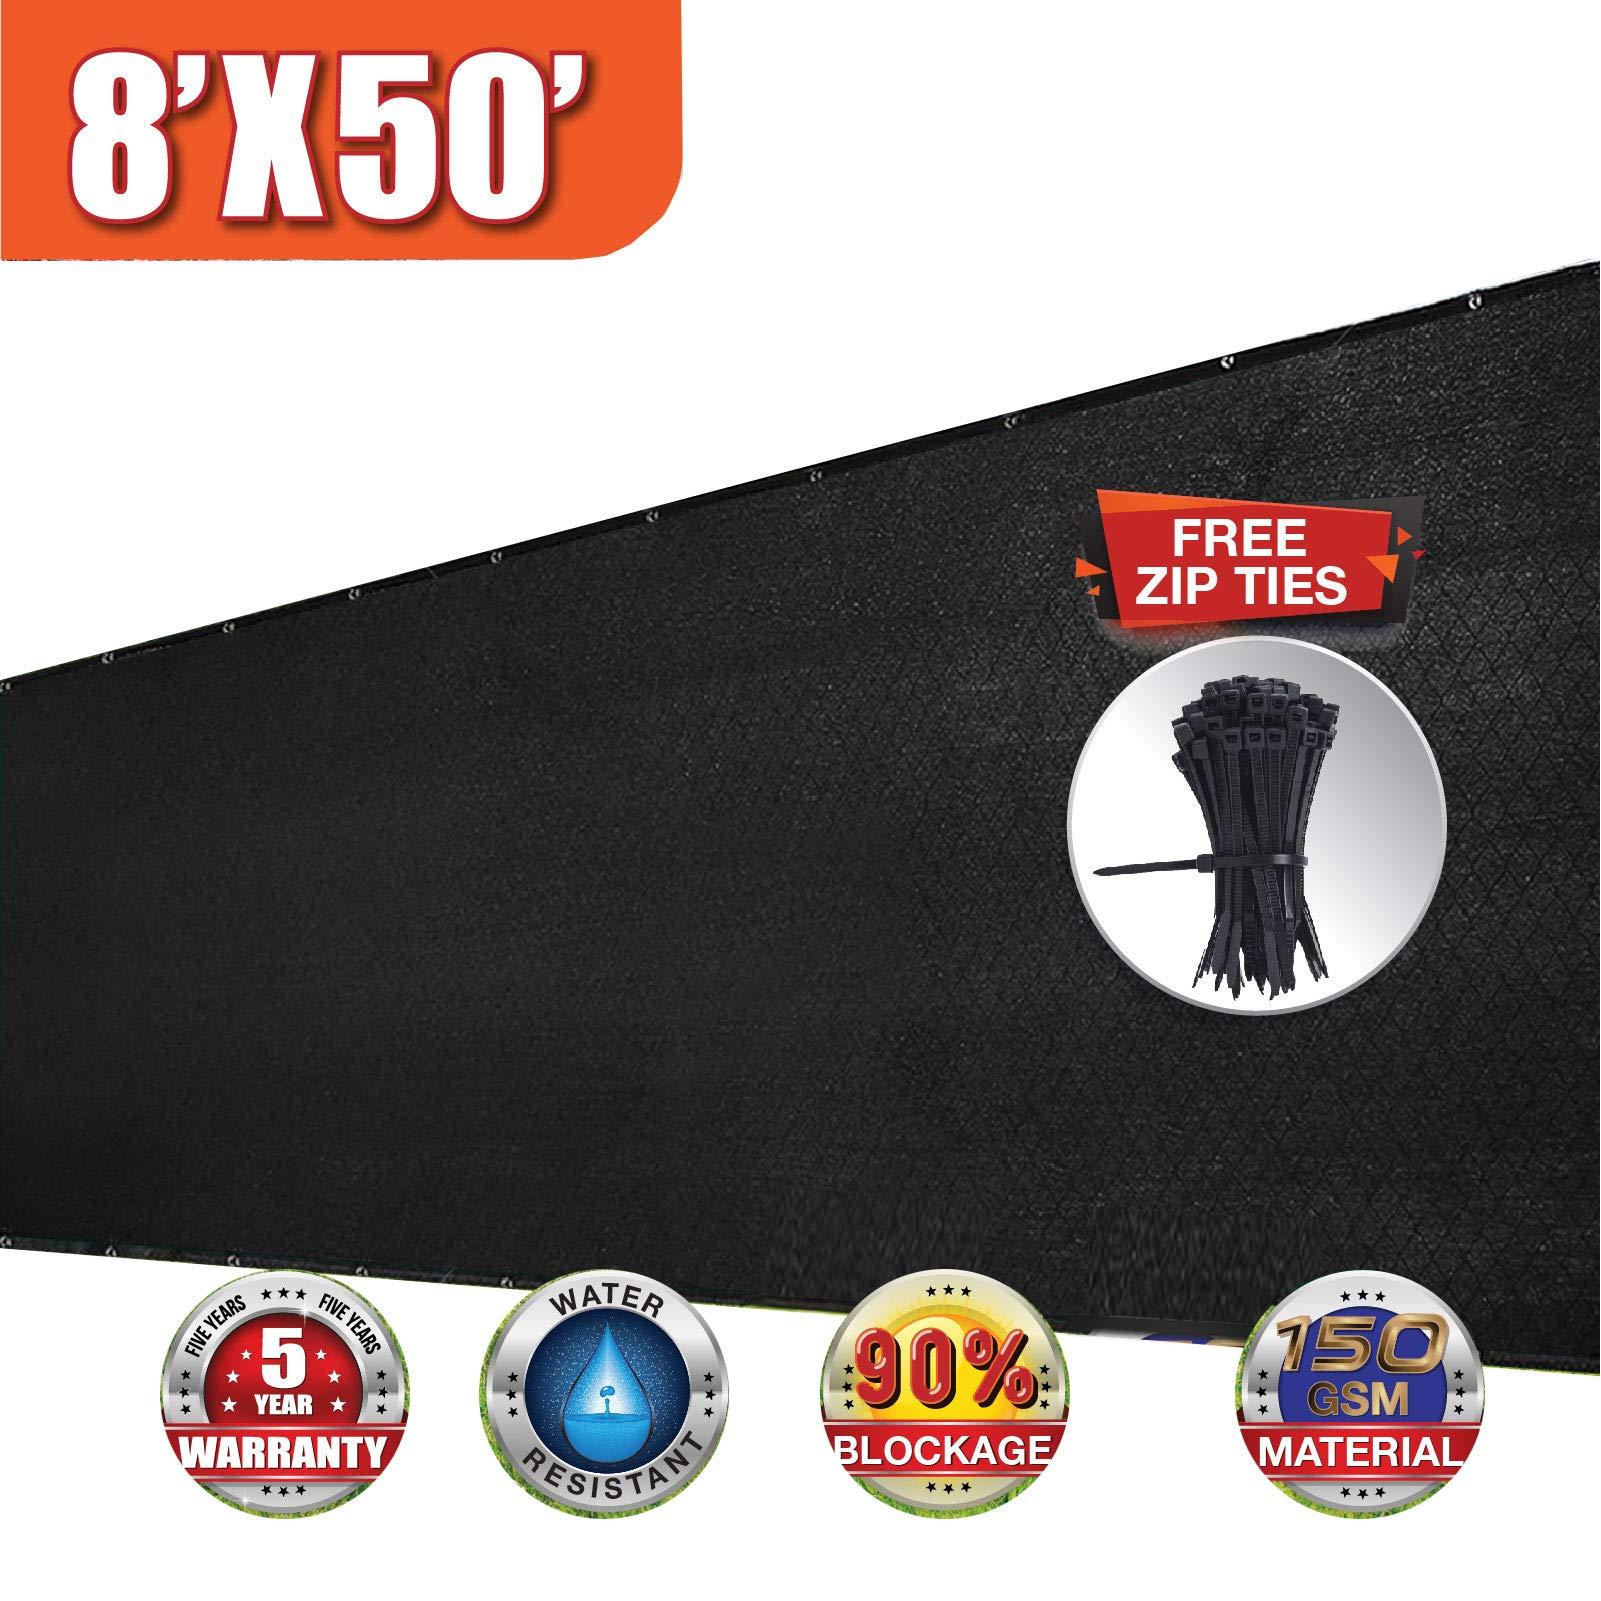 EVERGROW 8' x 50' Black Heavy Duty Privacy Screen Commercial Outdoor Shade Windscreen Mesh Fabric with Brass Grommet 150 GSM 90% UV Blockage Free Zip Ties 8 feet x 50 feet Black